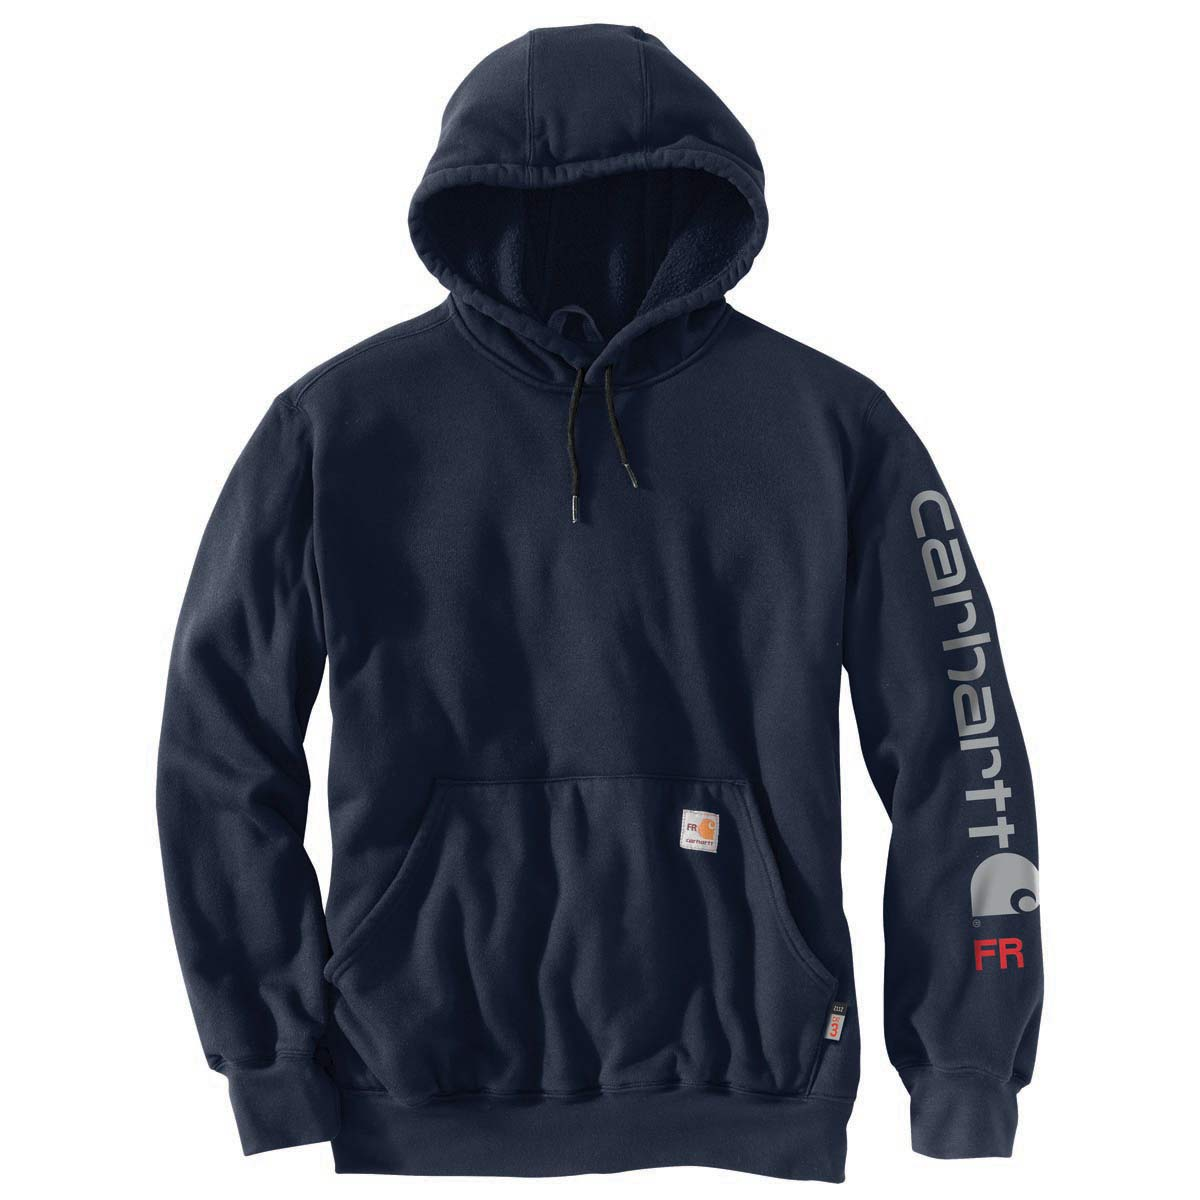 Carhartt Sweatshirt Midweight Signature Sleeve Logo Hooded Sweatshirt New Navy